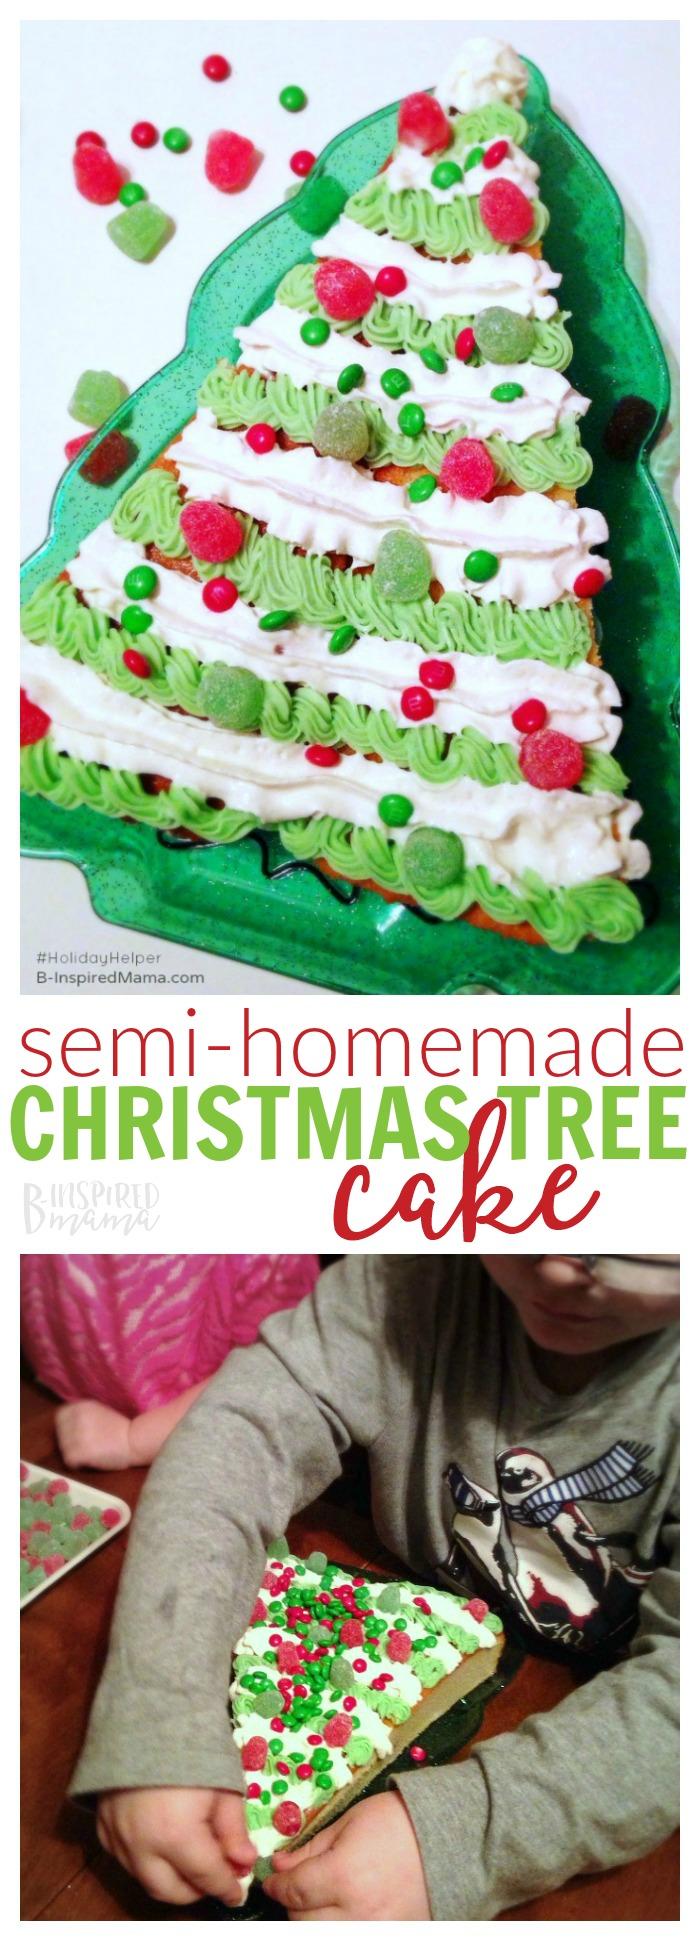 A Semi-Homemade Christmas Tree Christmas Cake - So easy the kids can do it!